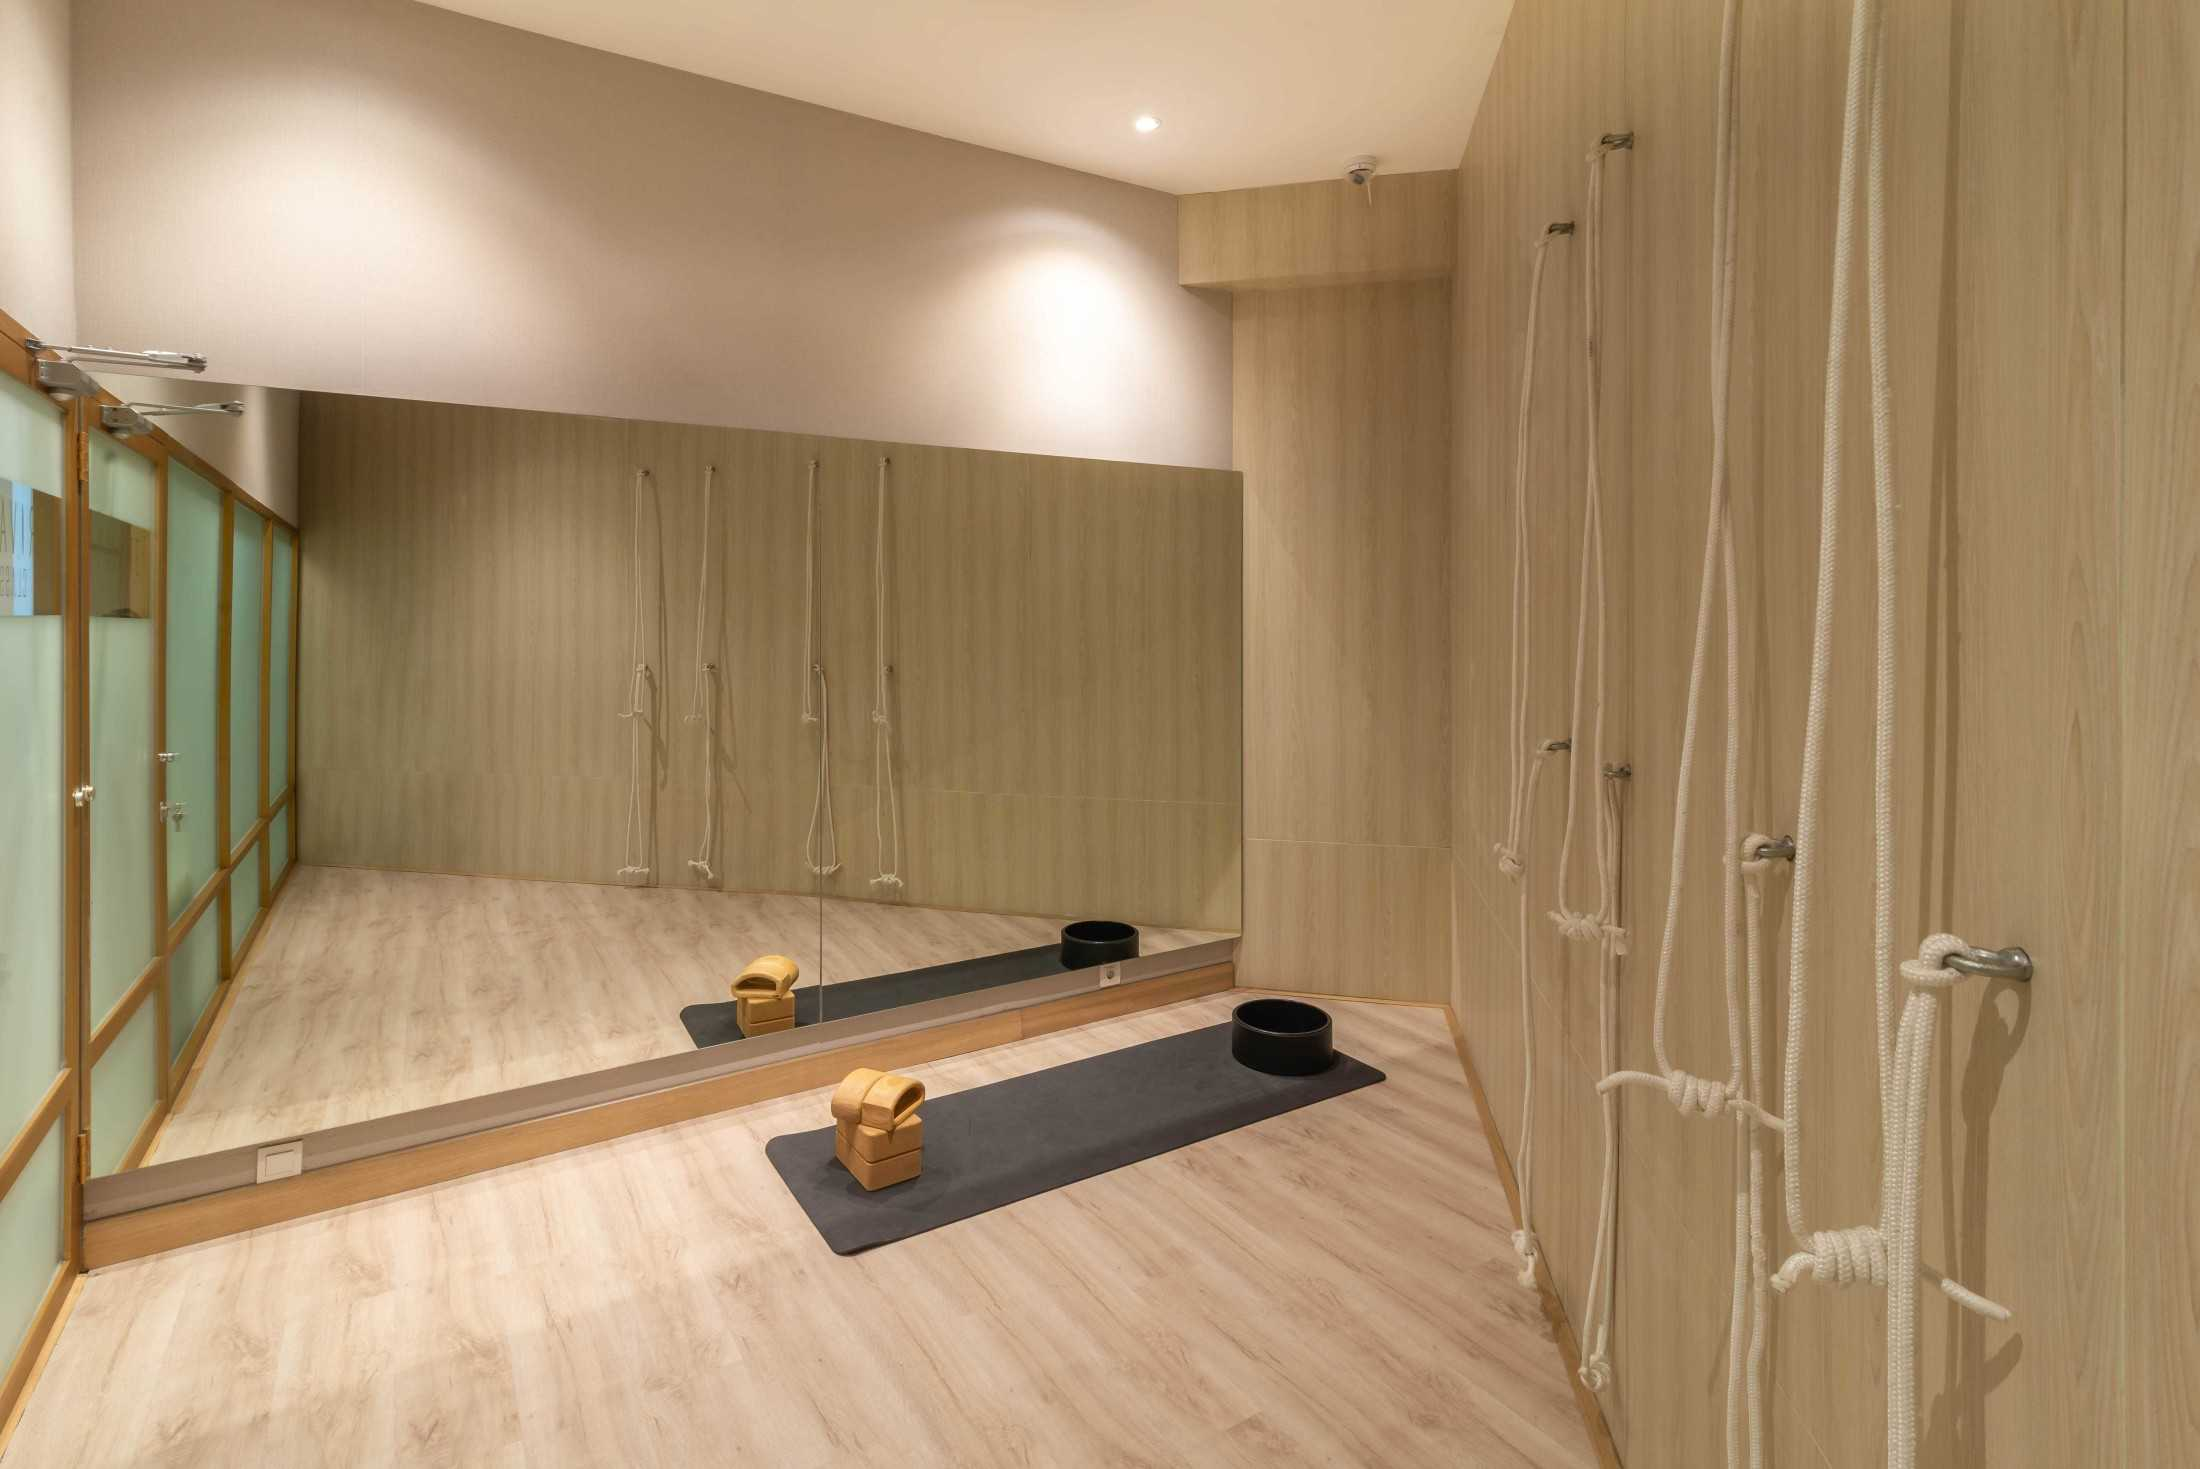 Archid Design&build Star Yoga Kec. Klp. Gading, Kota Jkt Utara, Daerah Khusus Ibukota Jakarta, Indonesia Kec. Klp. Gading, Kota Jkt Utara, Daerah Khusus Ibukota Jakarta, Indonesia Archid-Design-Build-Star-Yoga  88008